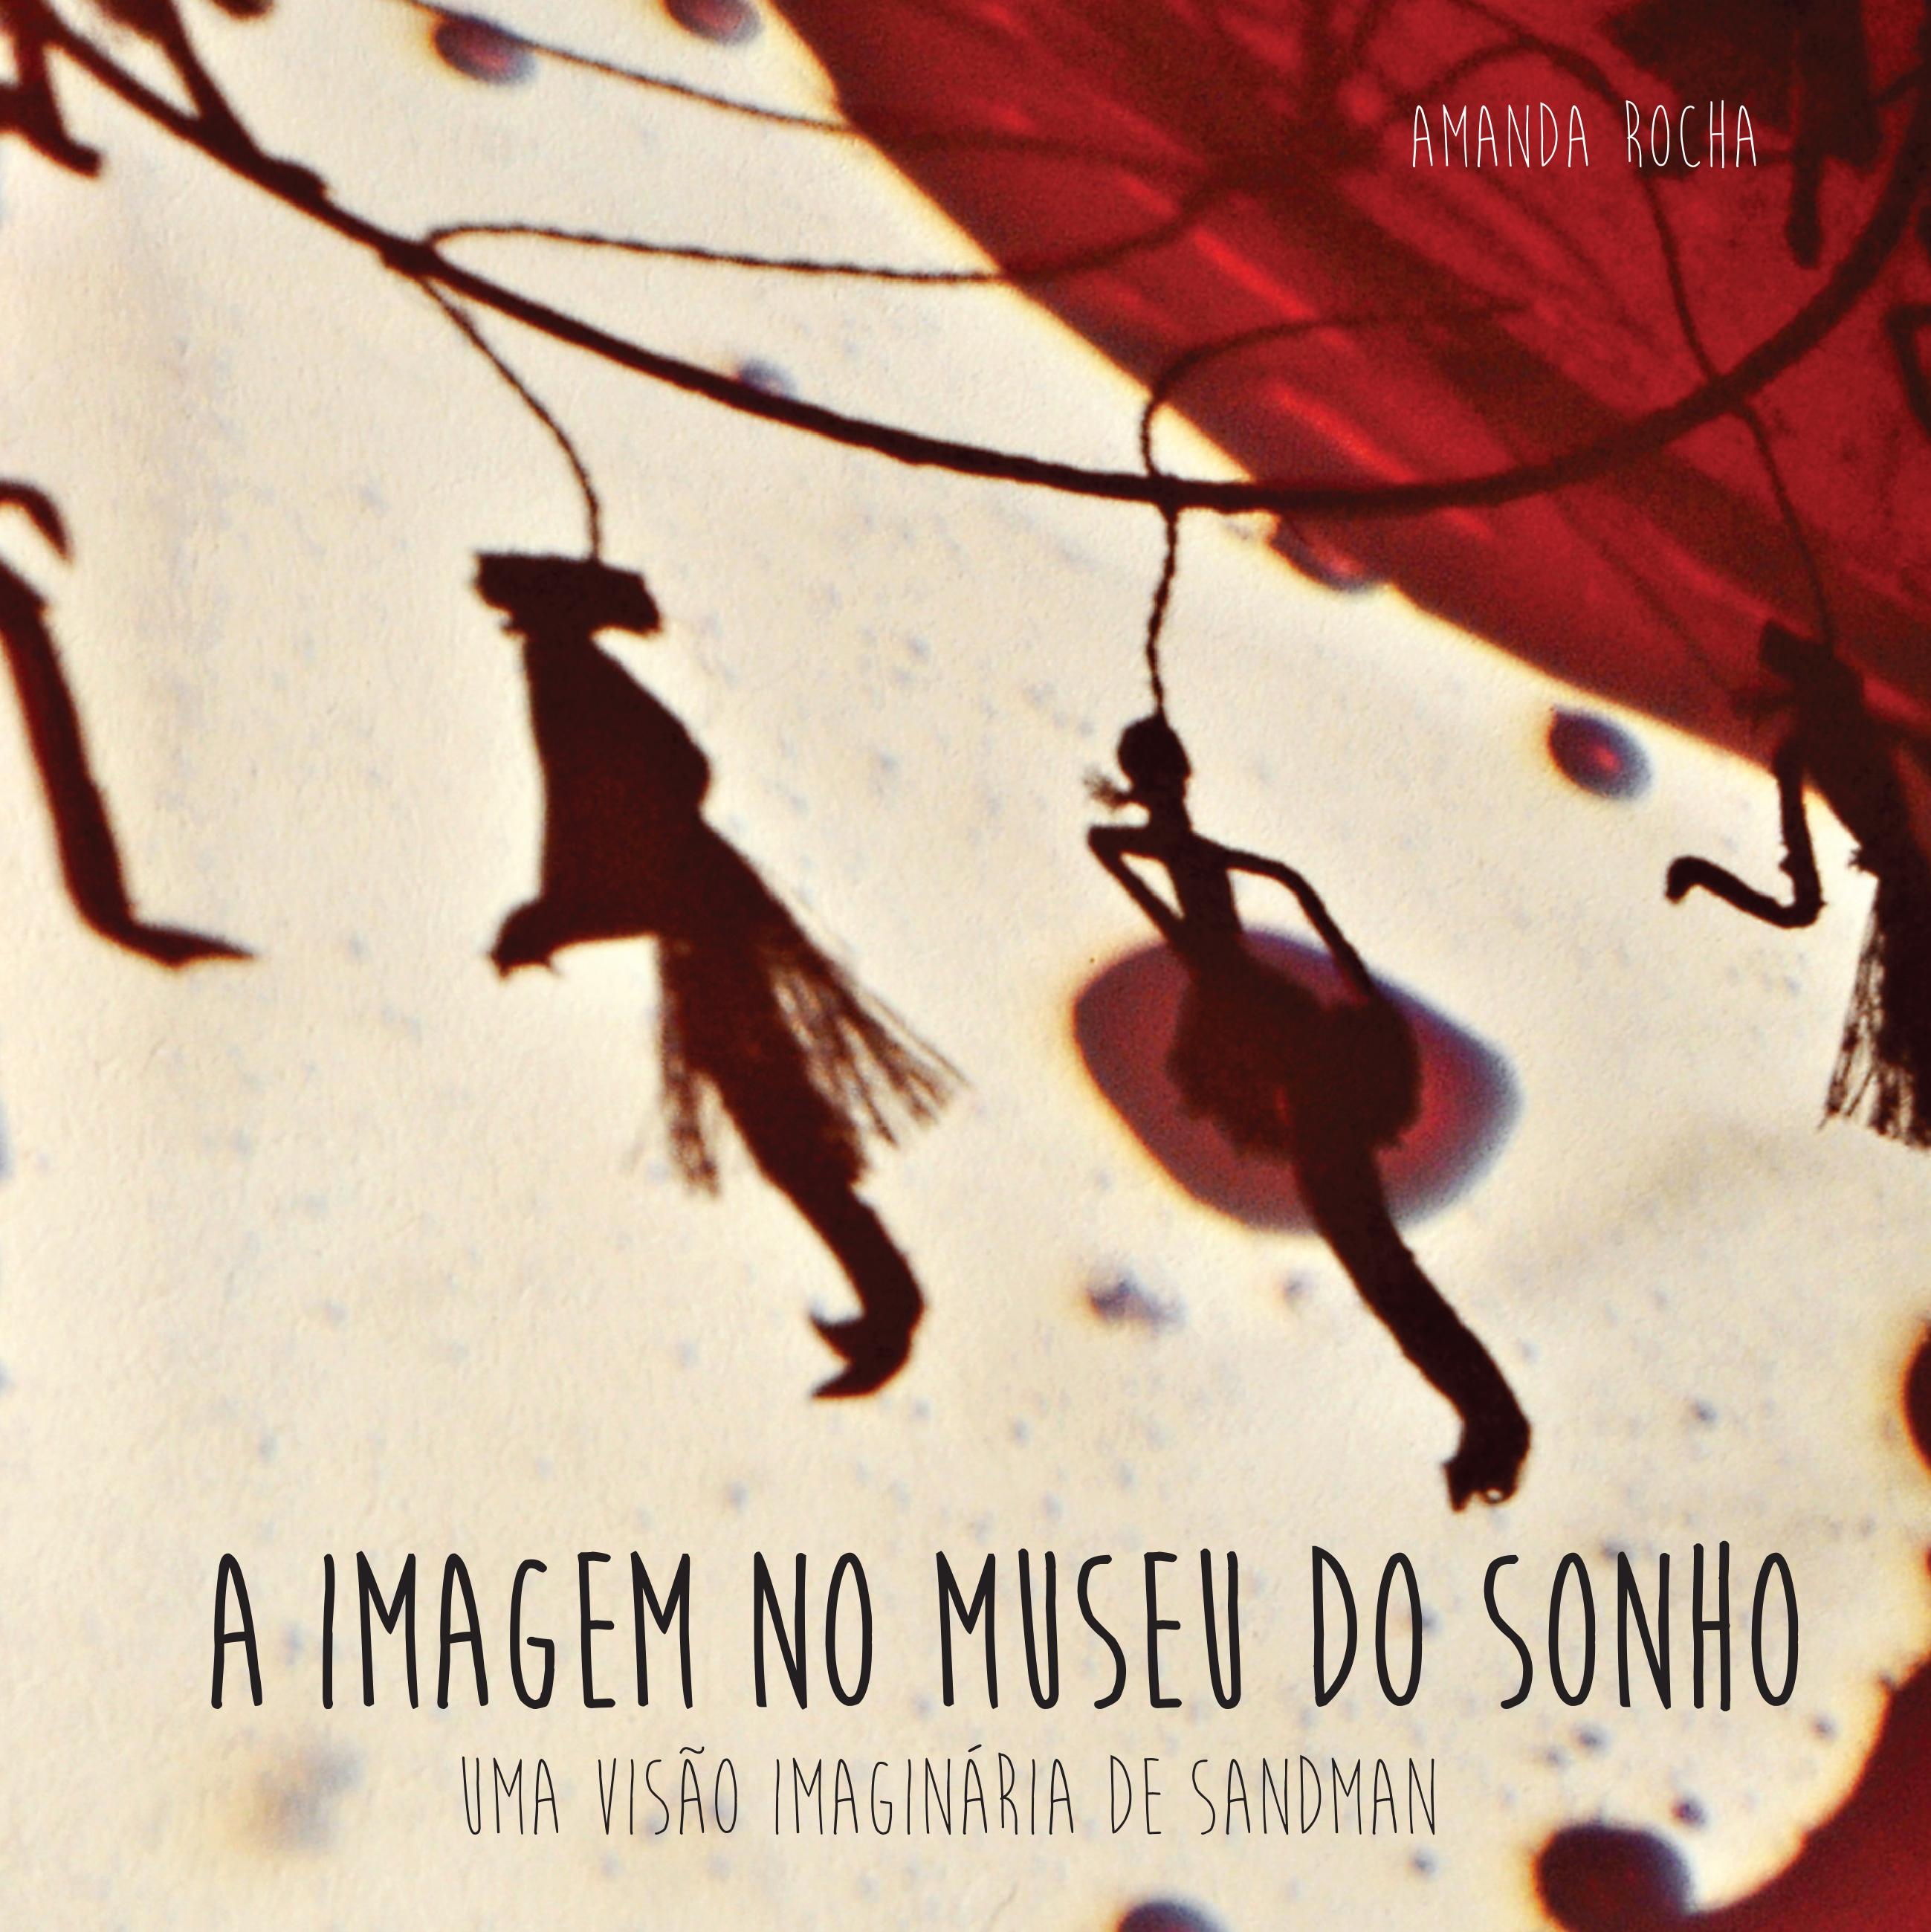 amanda_rocha_livro_anp